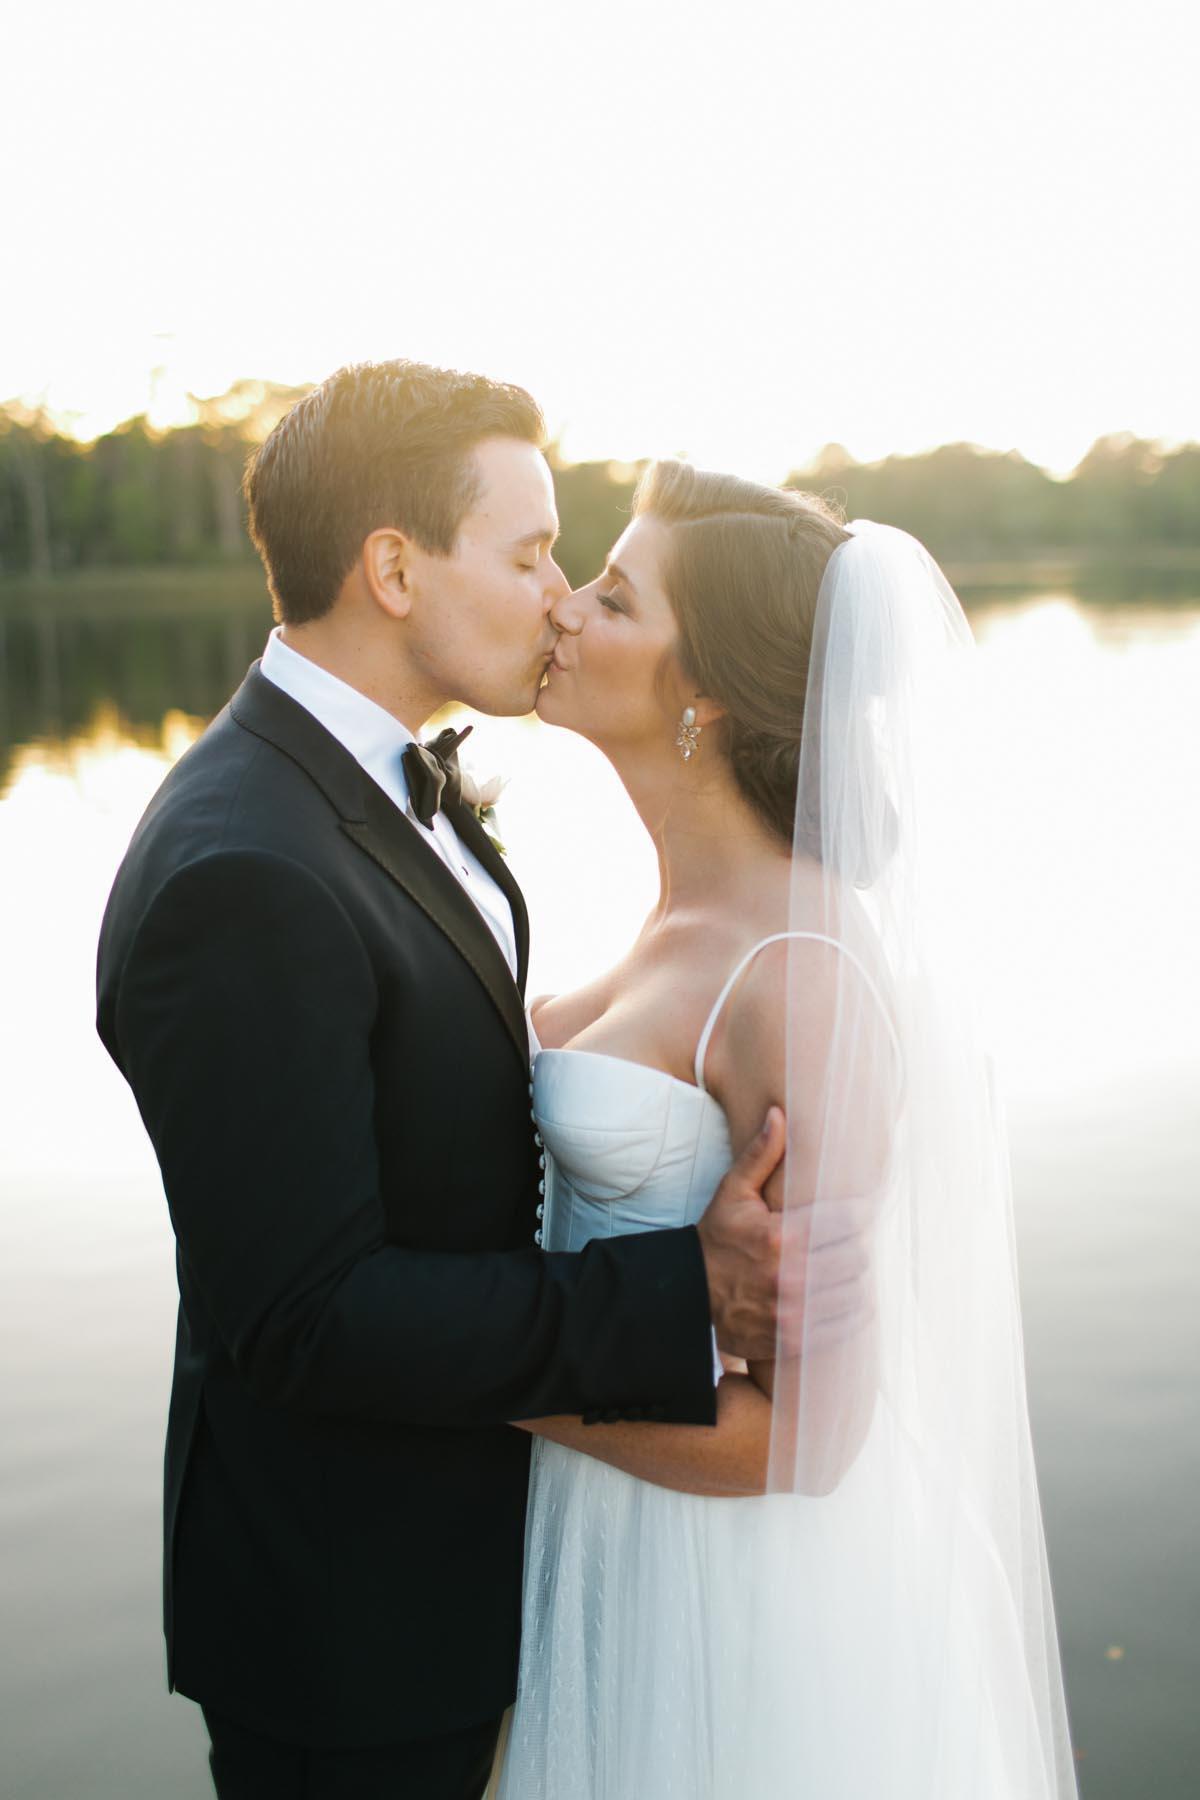 lowry wedding blog eden garden florida wedding-109